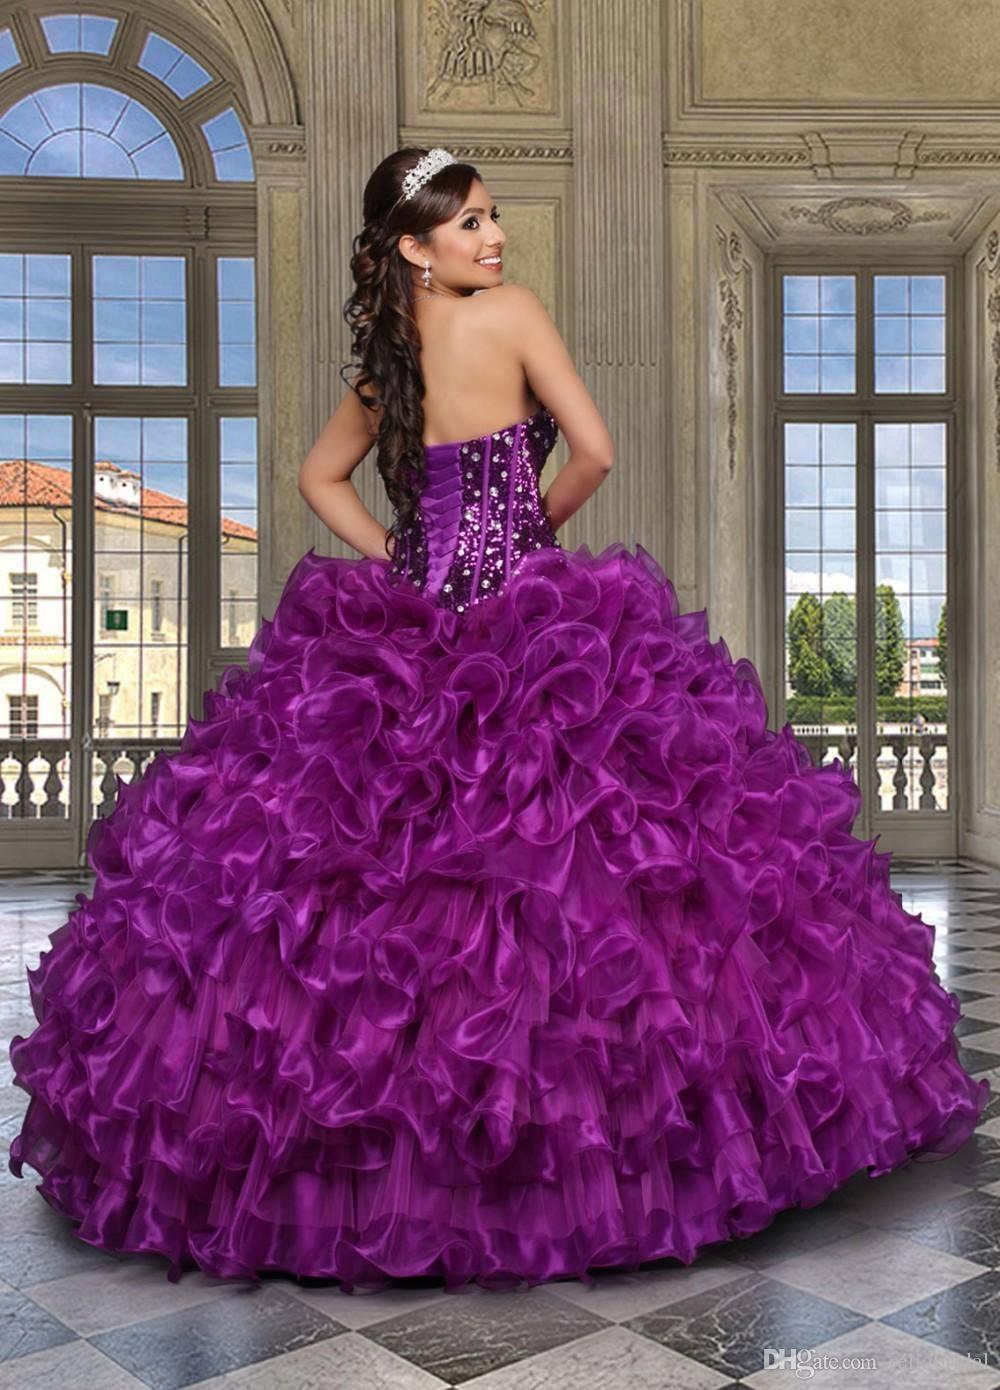 Encantador Vestido De Dama De Houston Motivo - Vestido de Novia Para ...